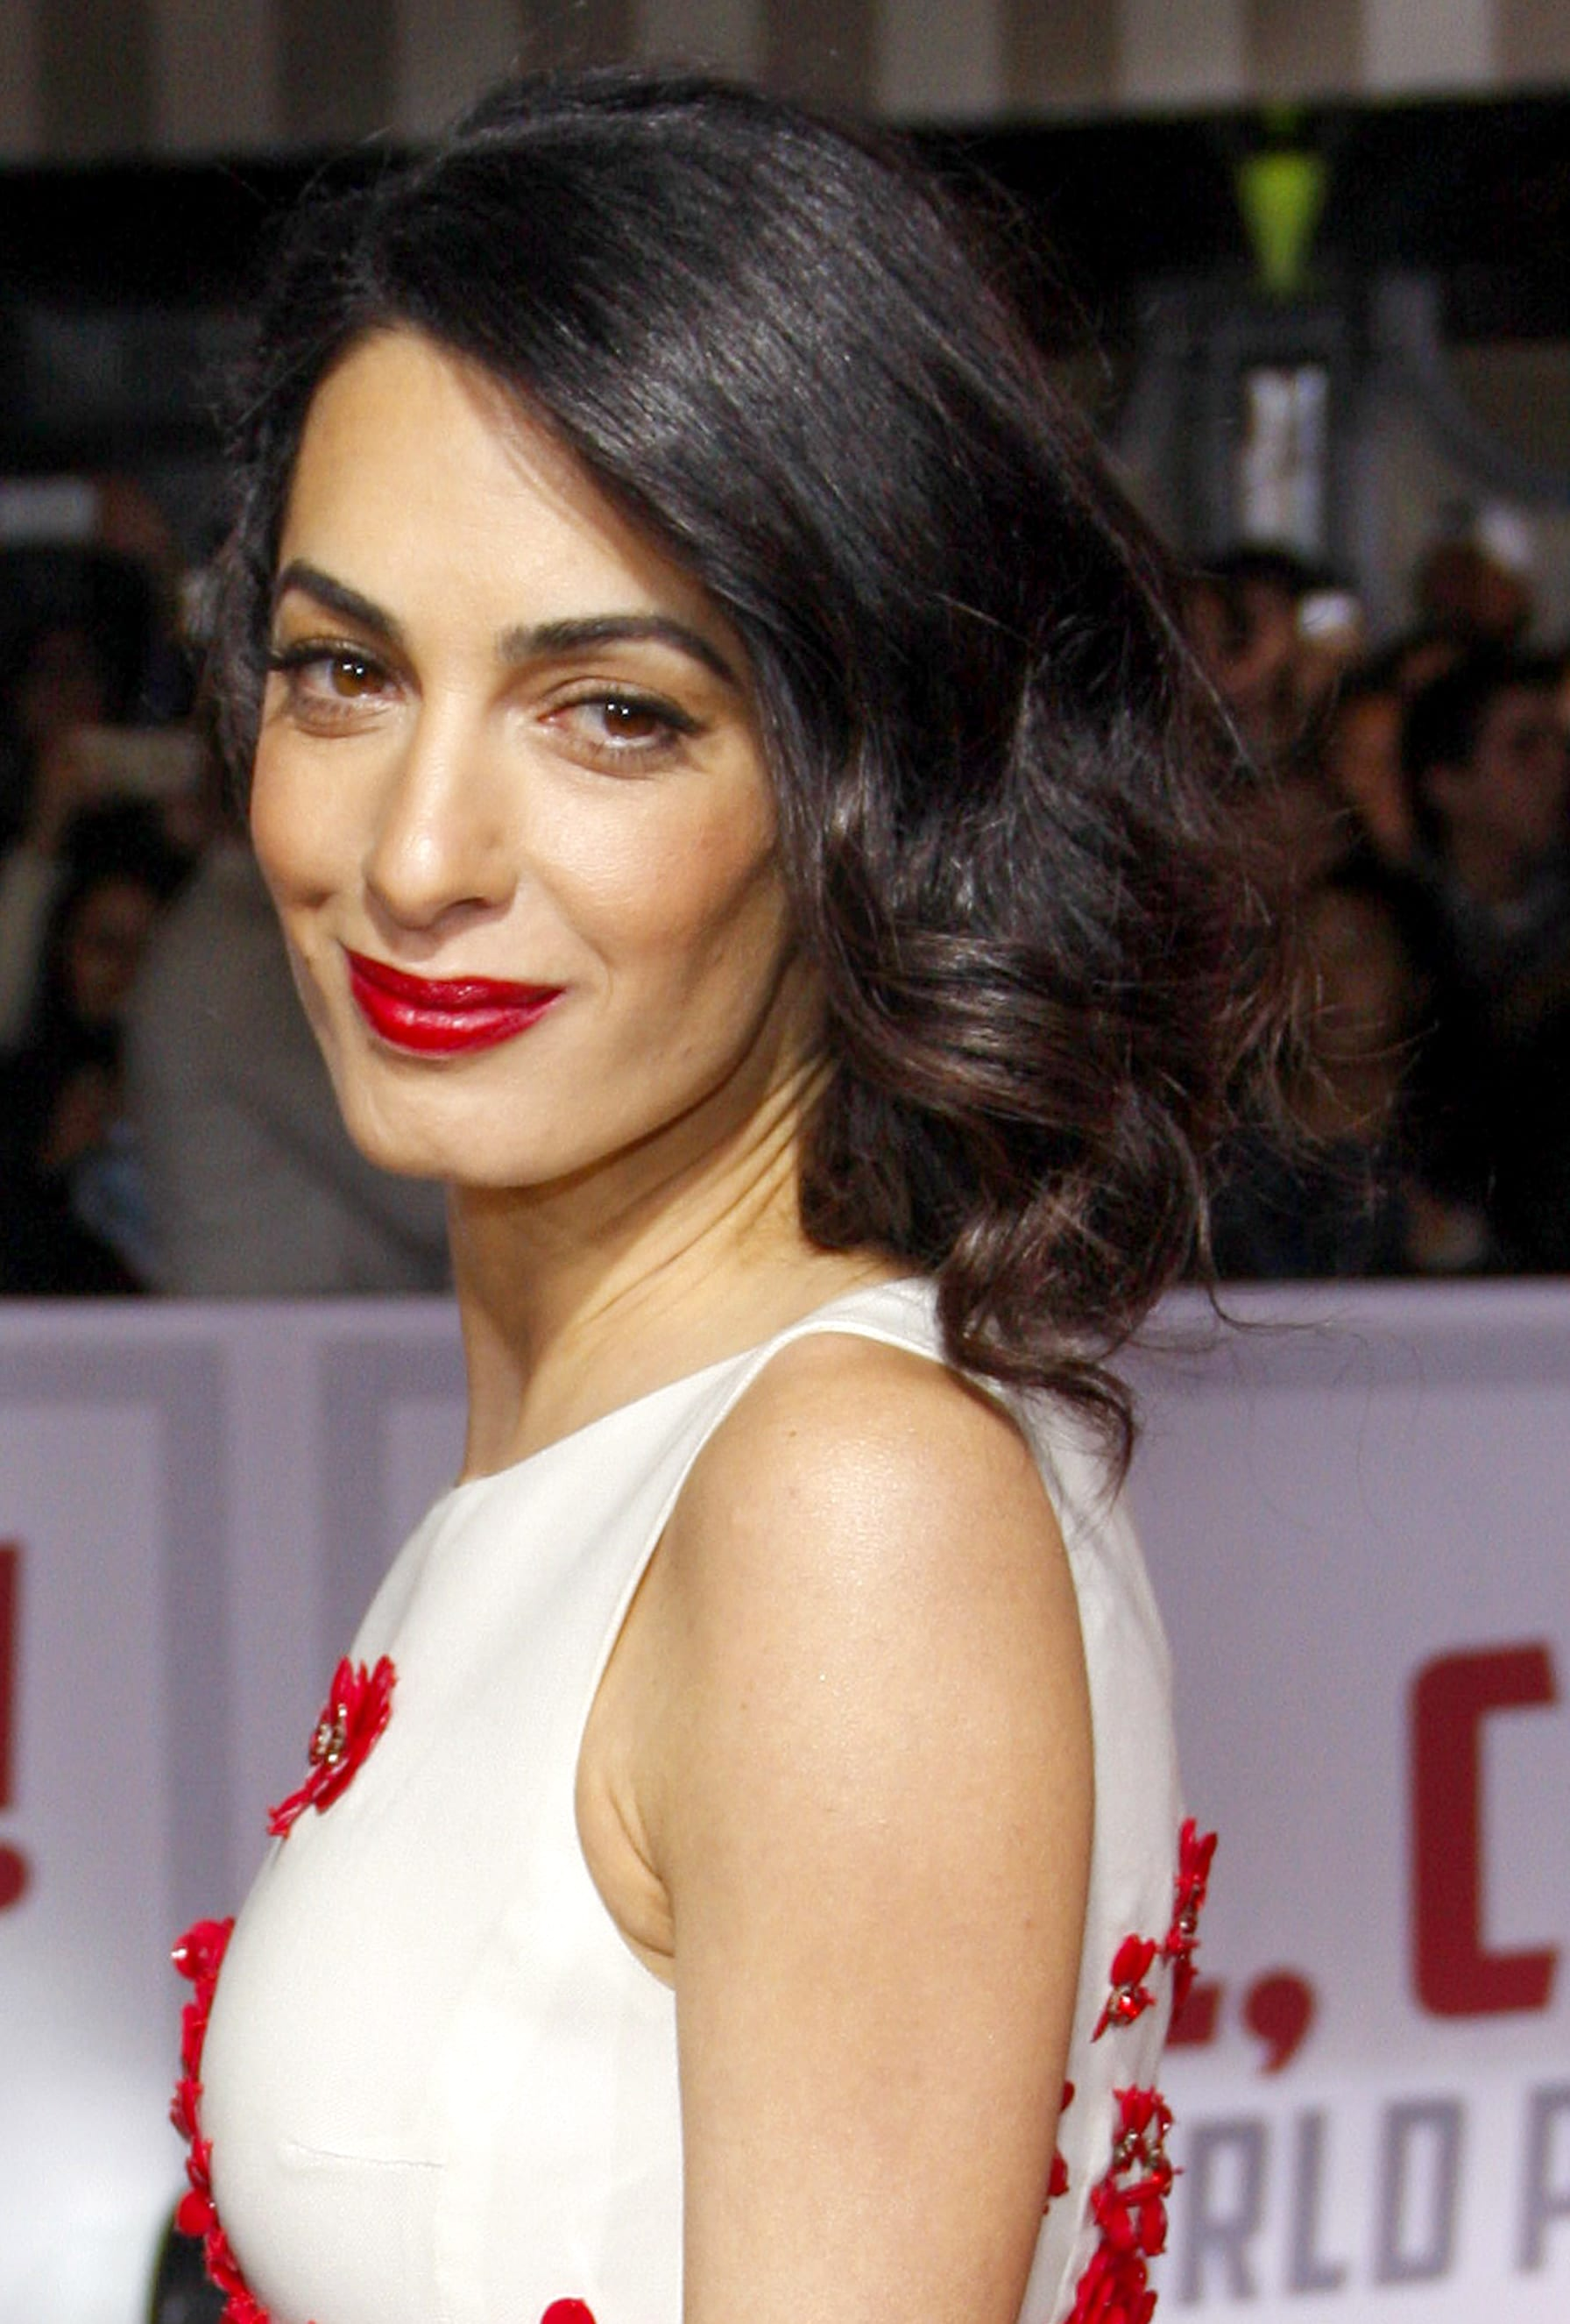 Amal Clooney's Side Swept Bob